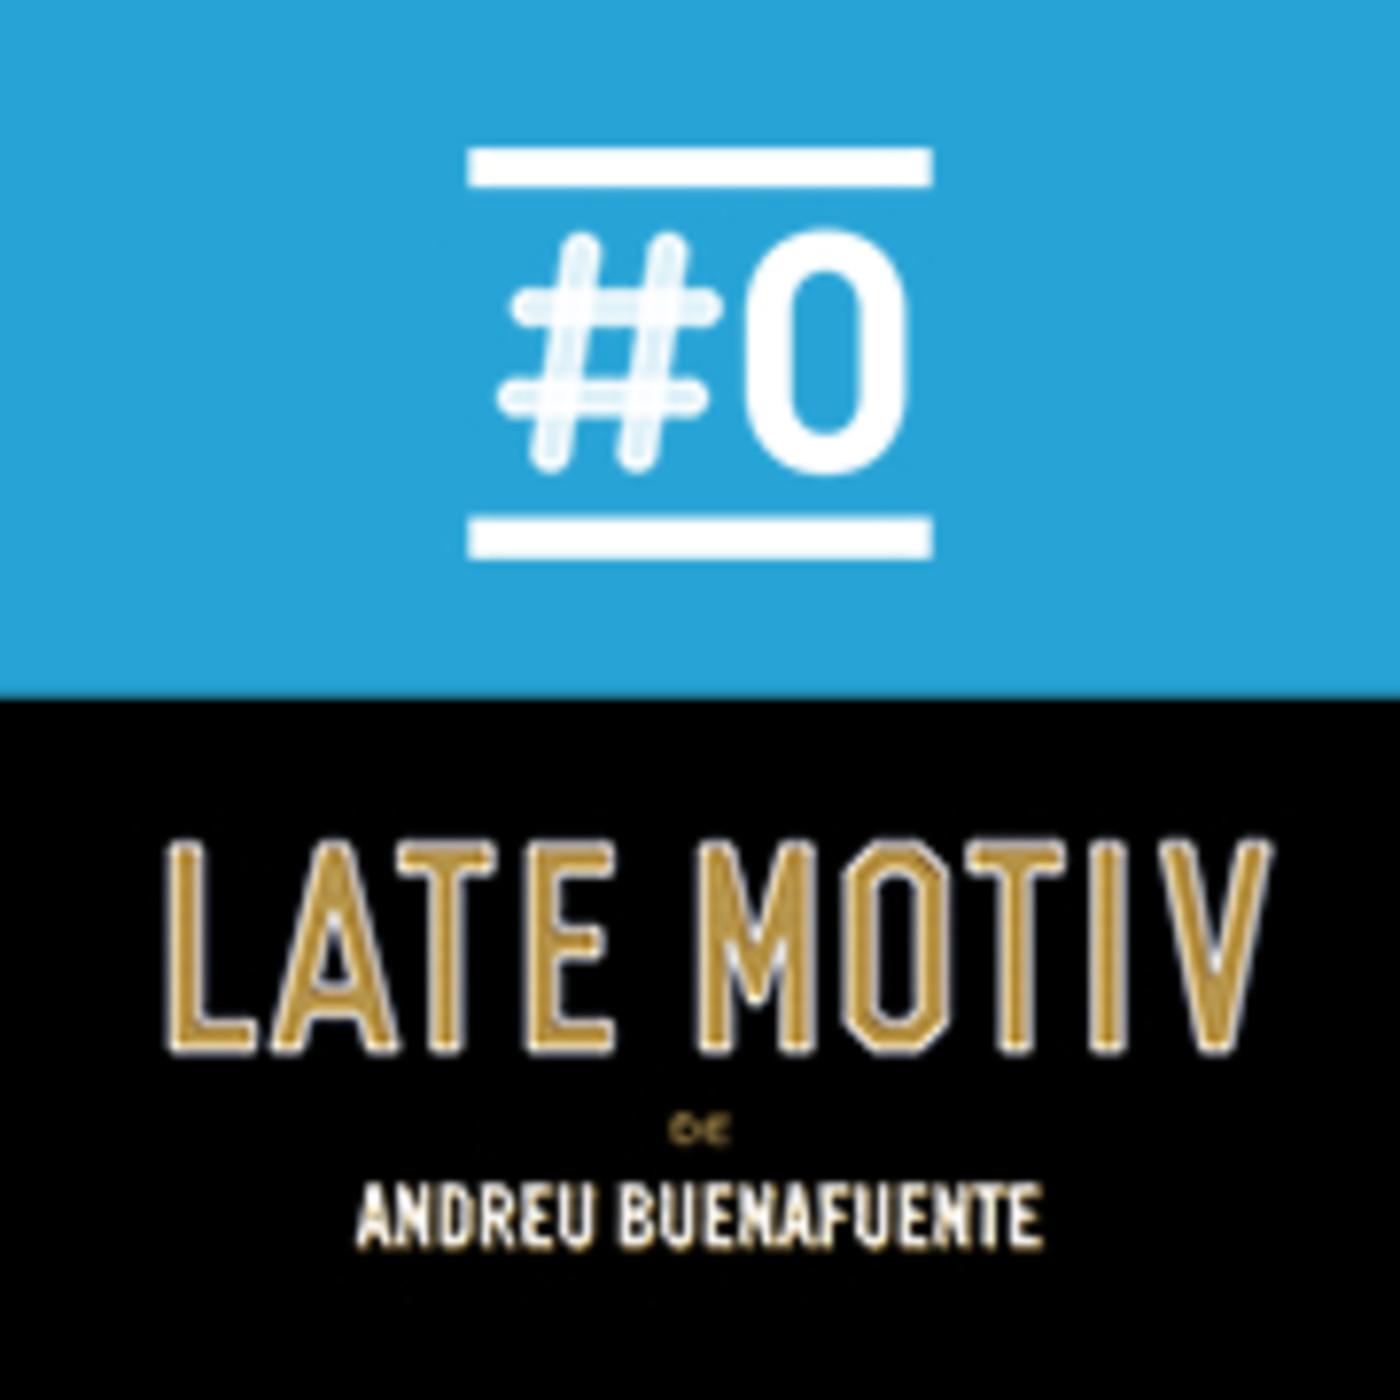 LATE MOTIV 579 - Programa completo